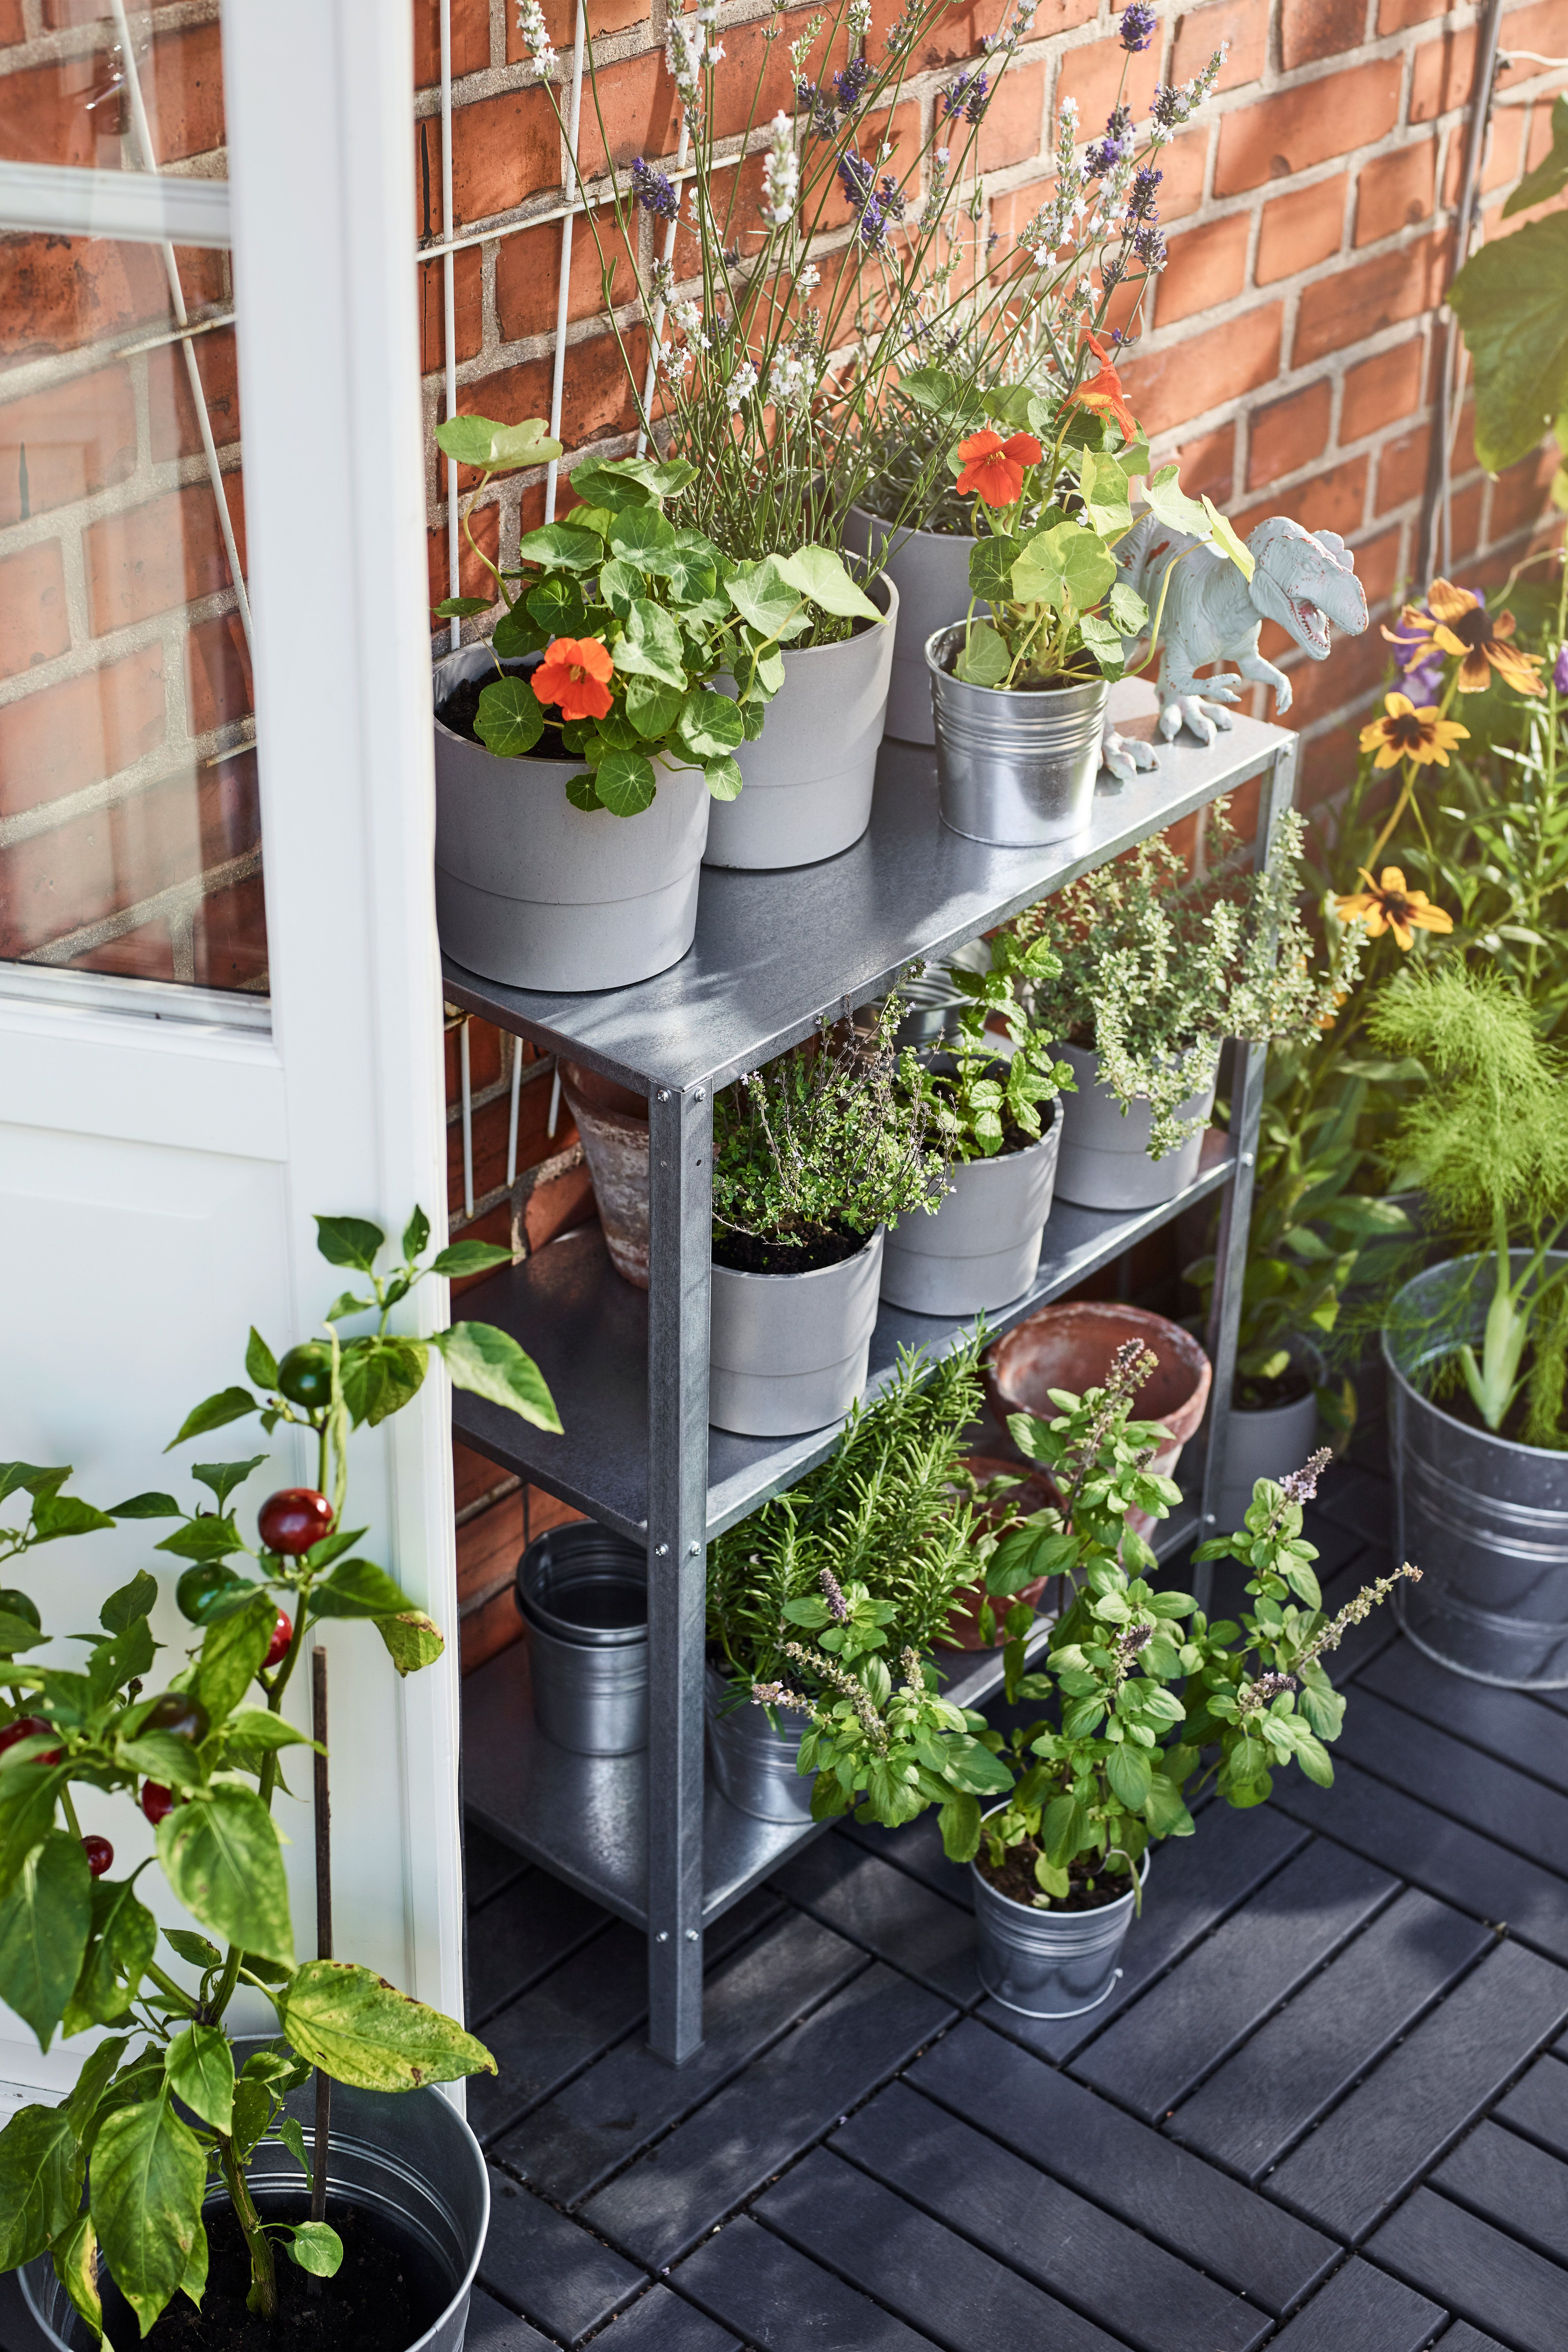 Pflanzen Pflanzentopfe Indoor Garten Gartendesign Ideen Pflanzen